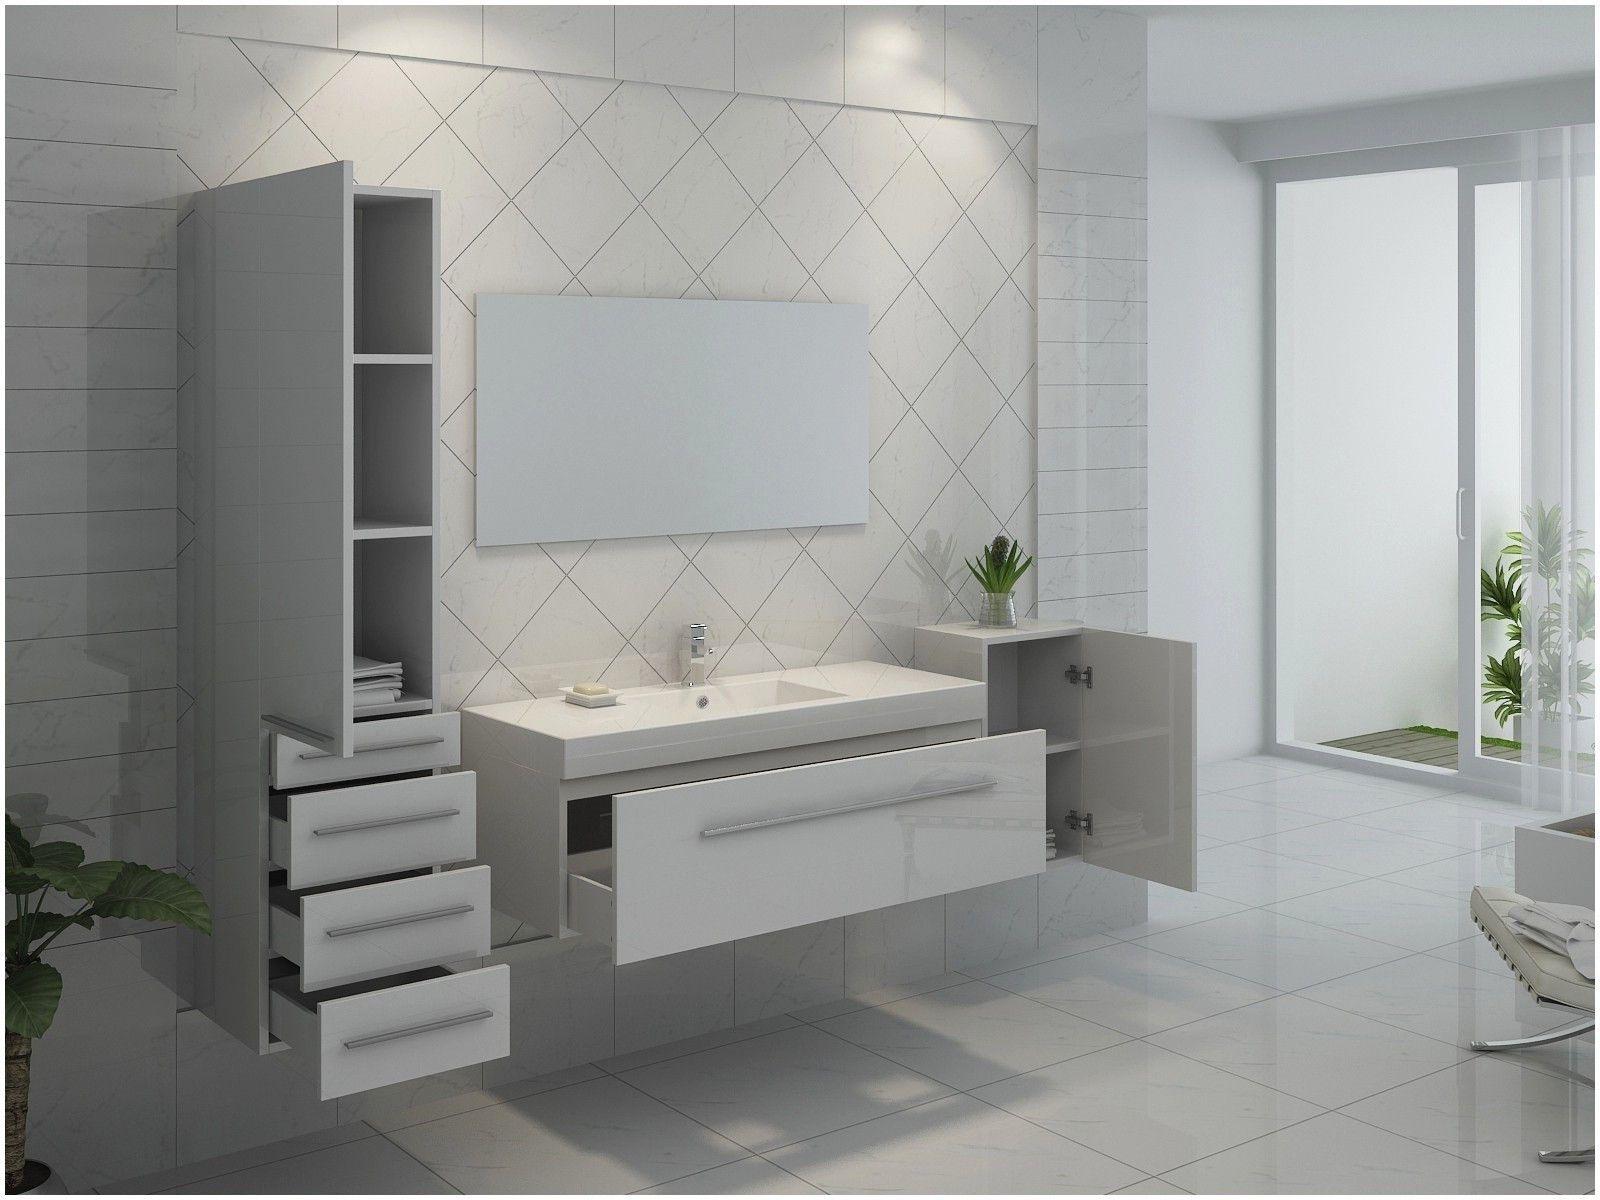 Awesome modele salle de bain zen am nagement salle de - Faience salle de bain zen ...